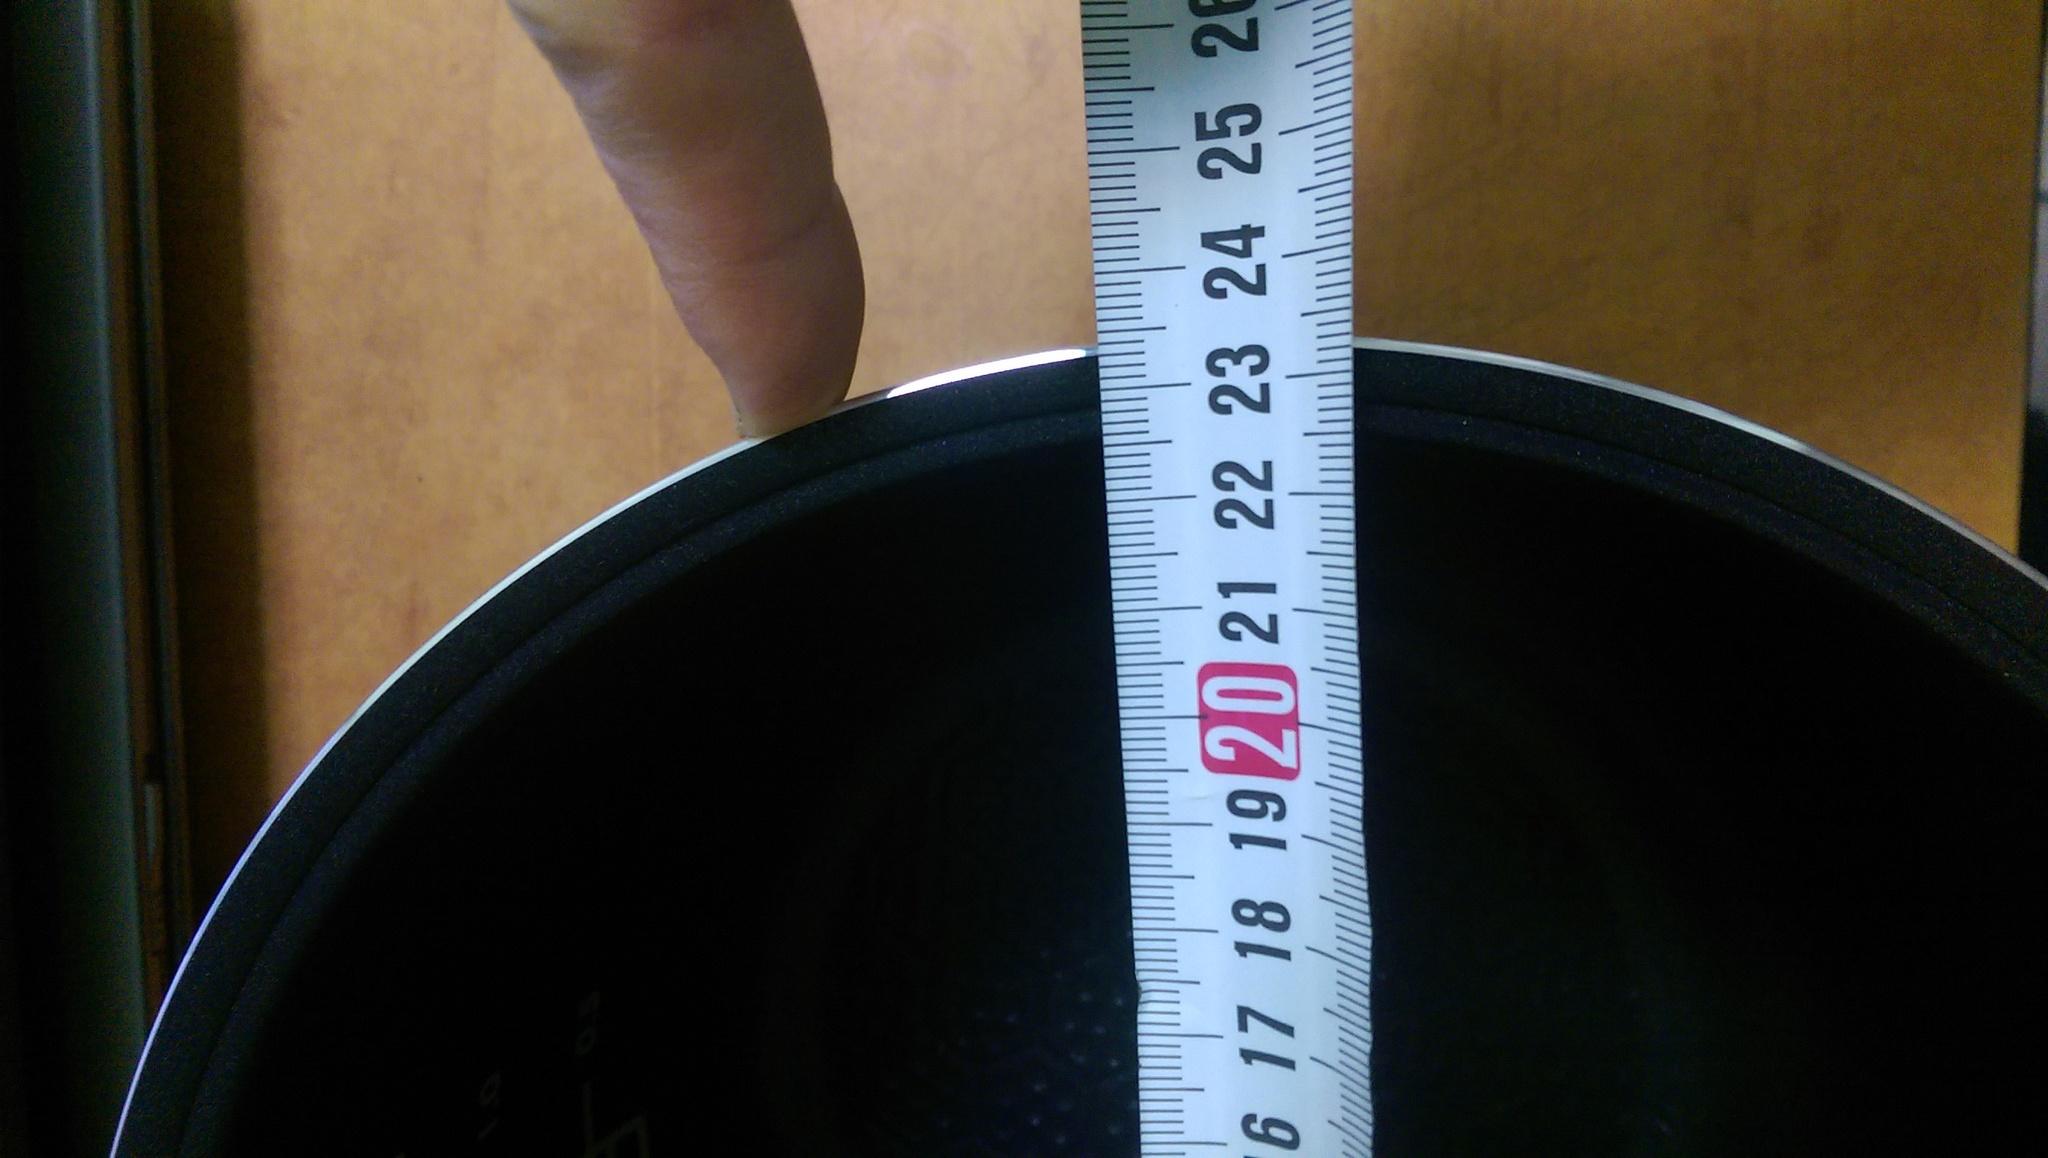 Мультиварка Mystery MCM-1010 Диаметр чаши составляет 23.4 см (234 мм)